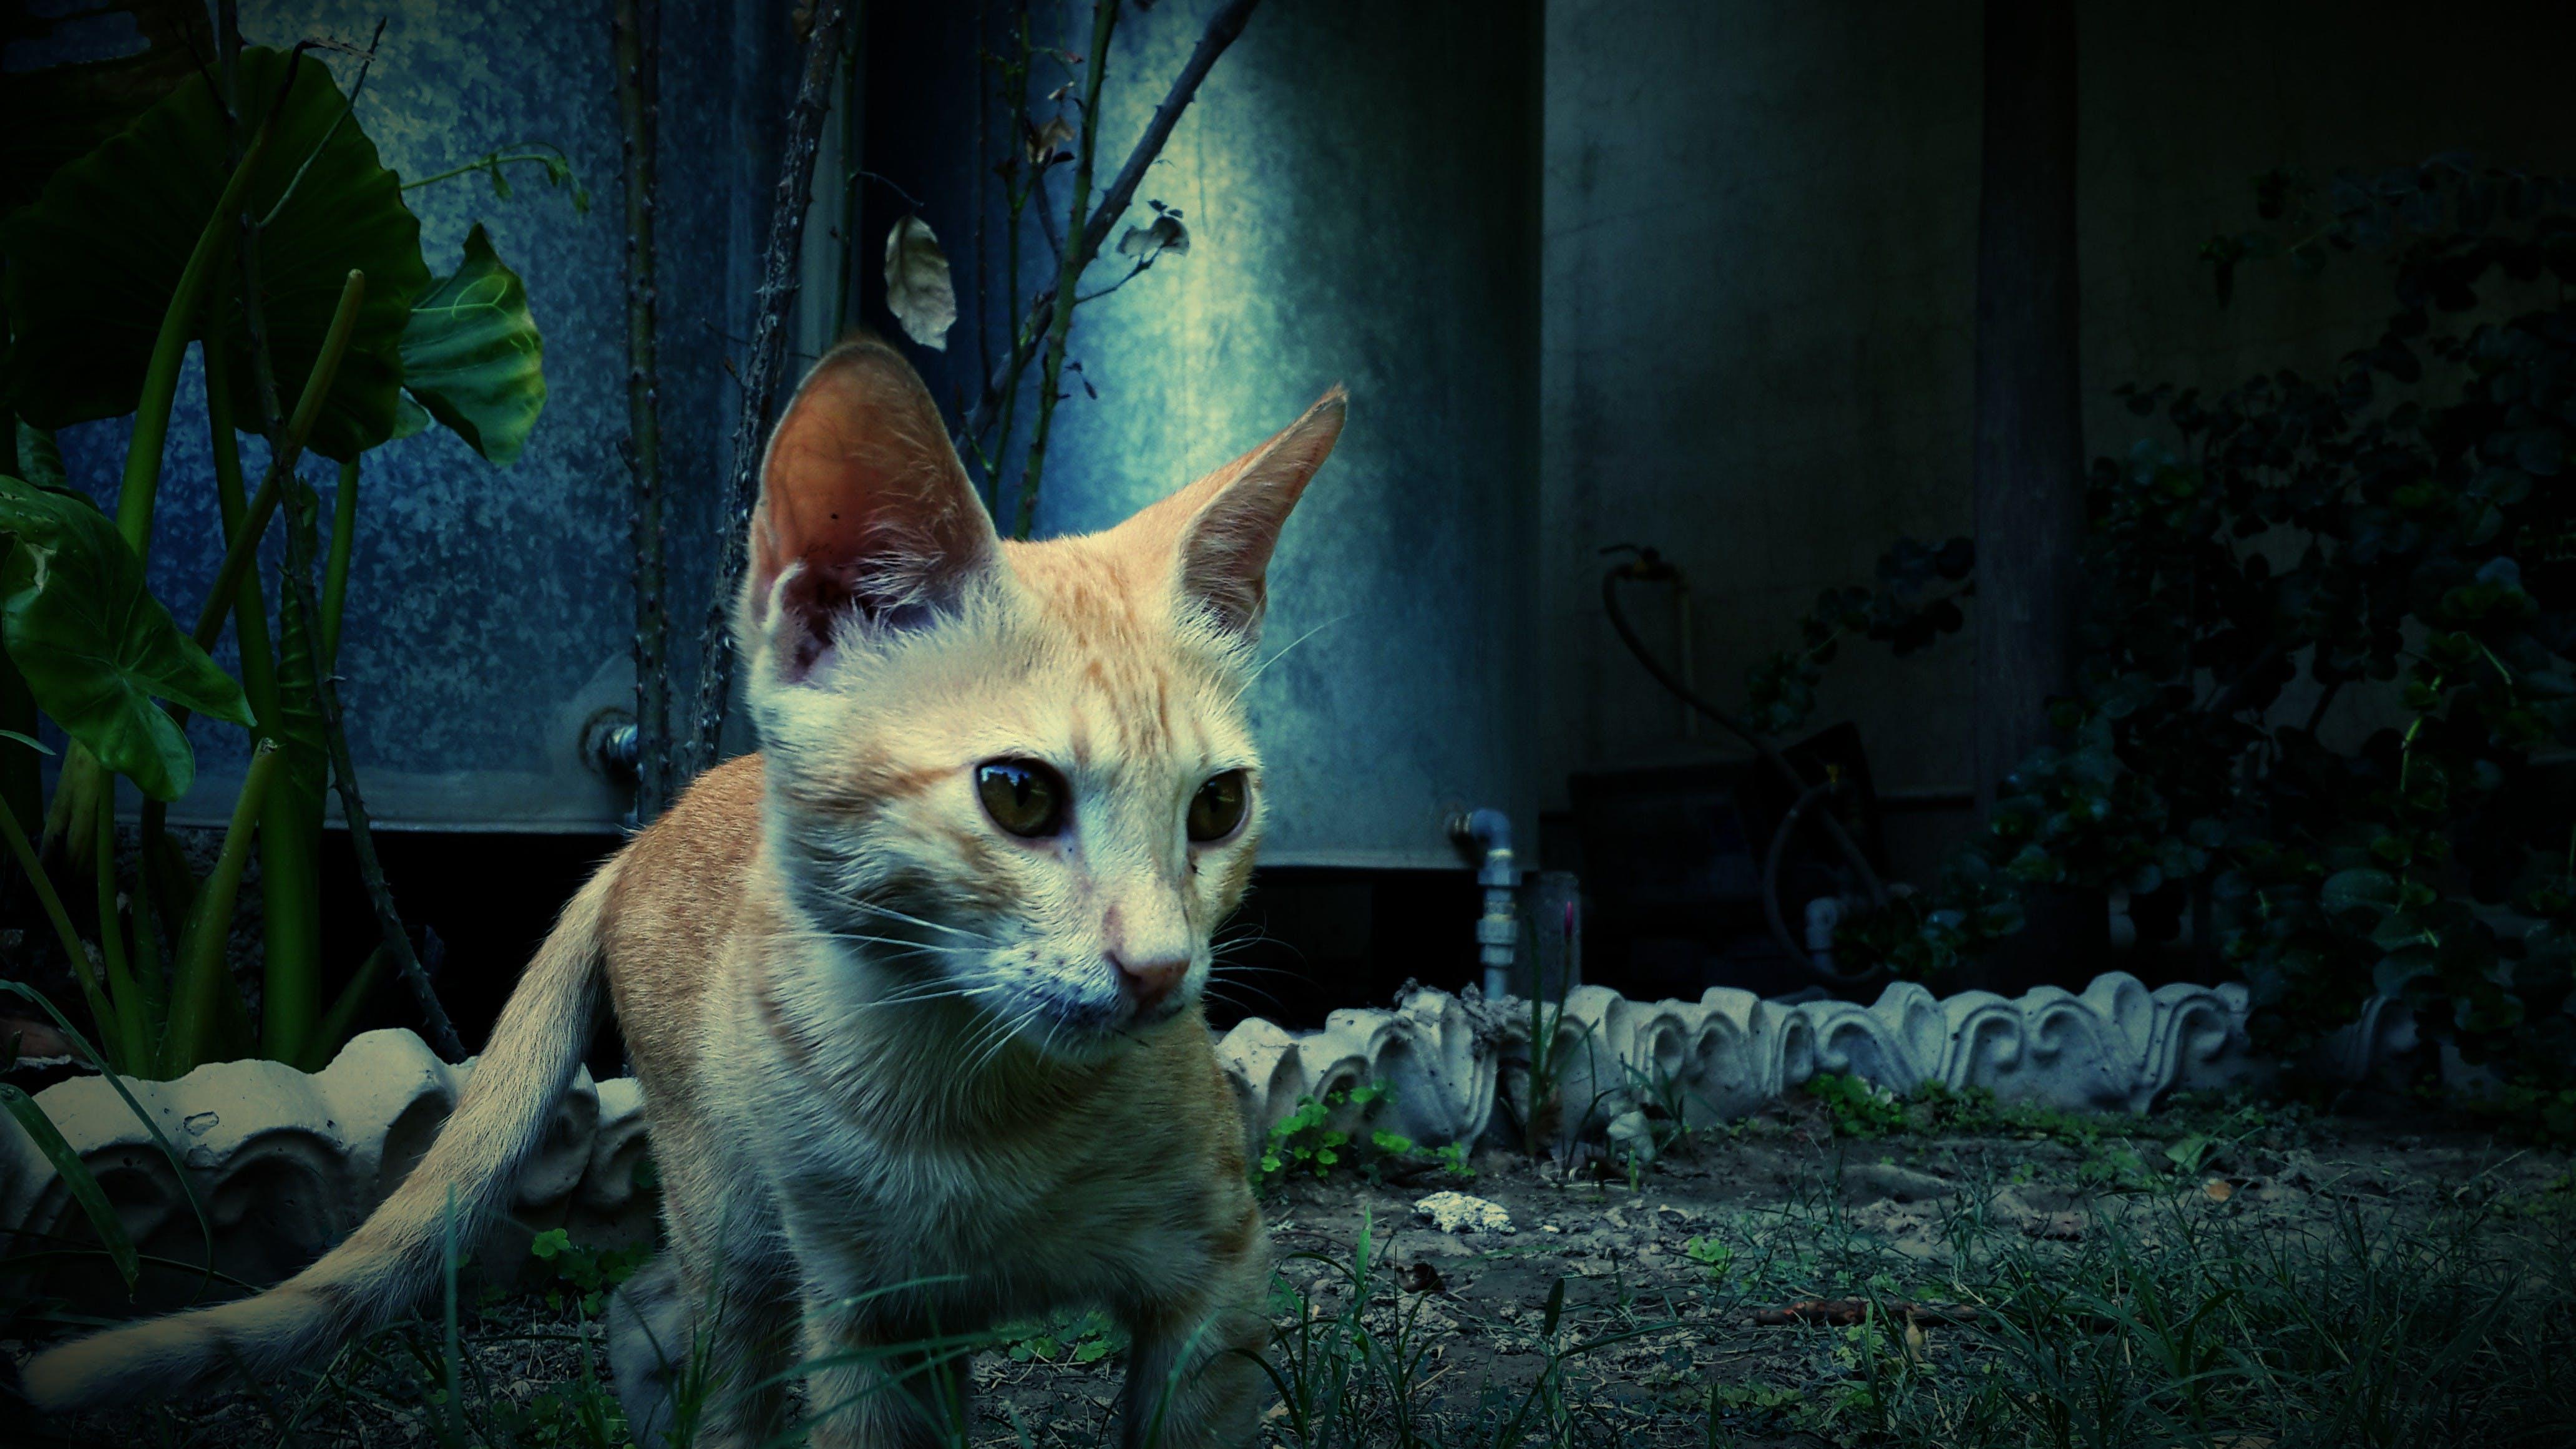 Photography of Orange Cat Near Green Plant